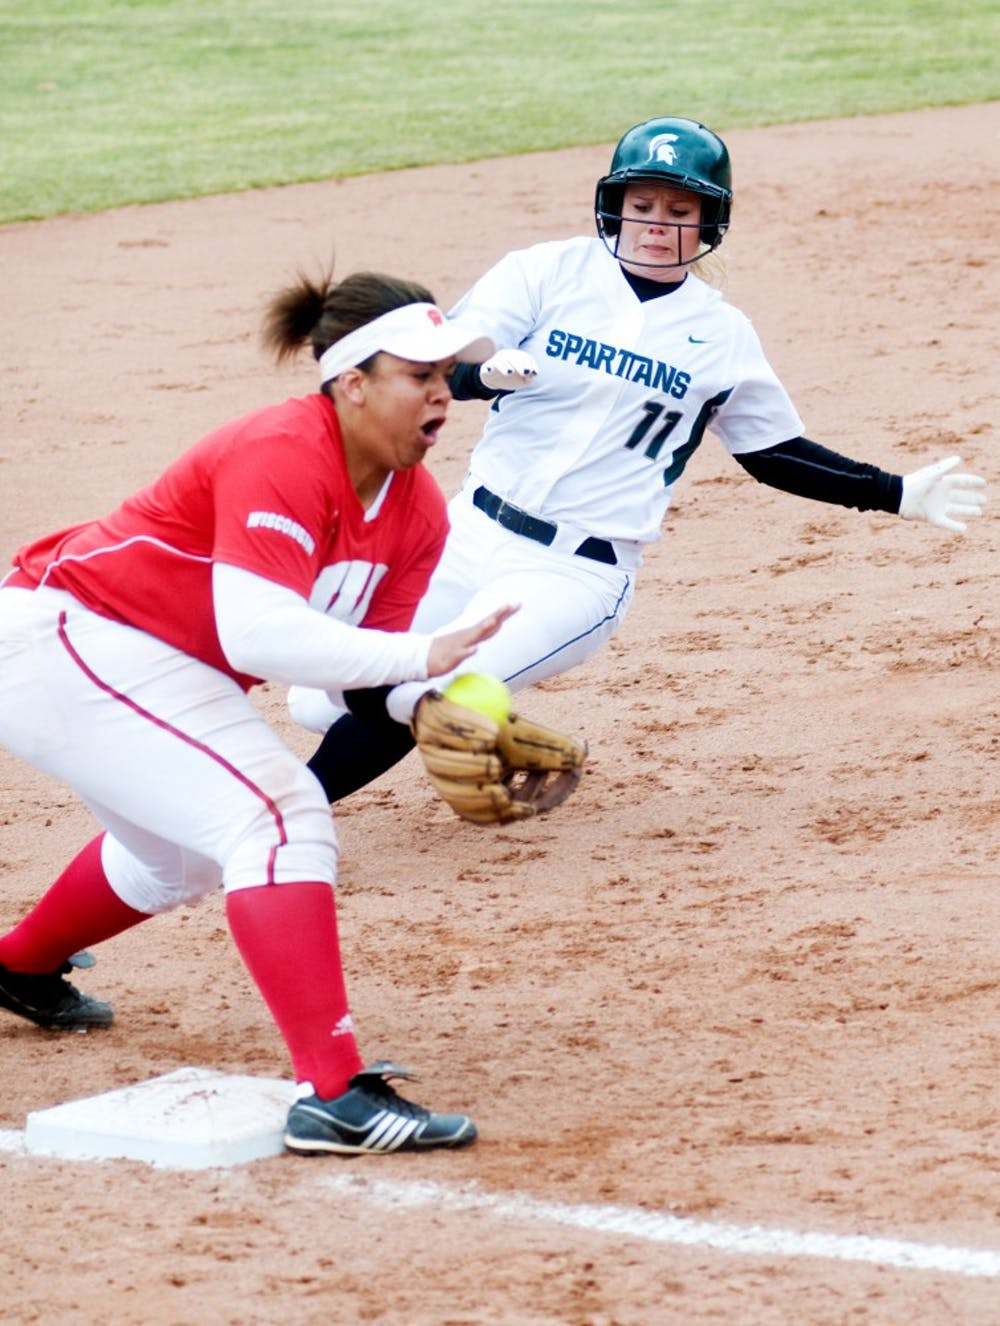 Senior first baseman Heidi Purtzer runs into third base as Wisconsin third baseman Shannel Blackshear catches the ball during Saturday's home game at Secchia Stadium. Lauren Wood/The State News